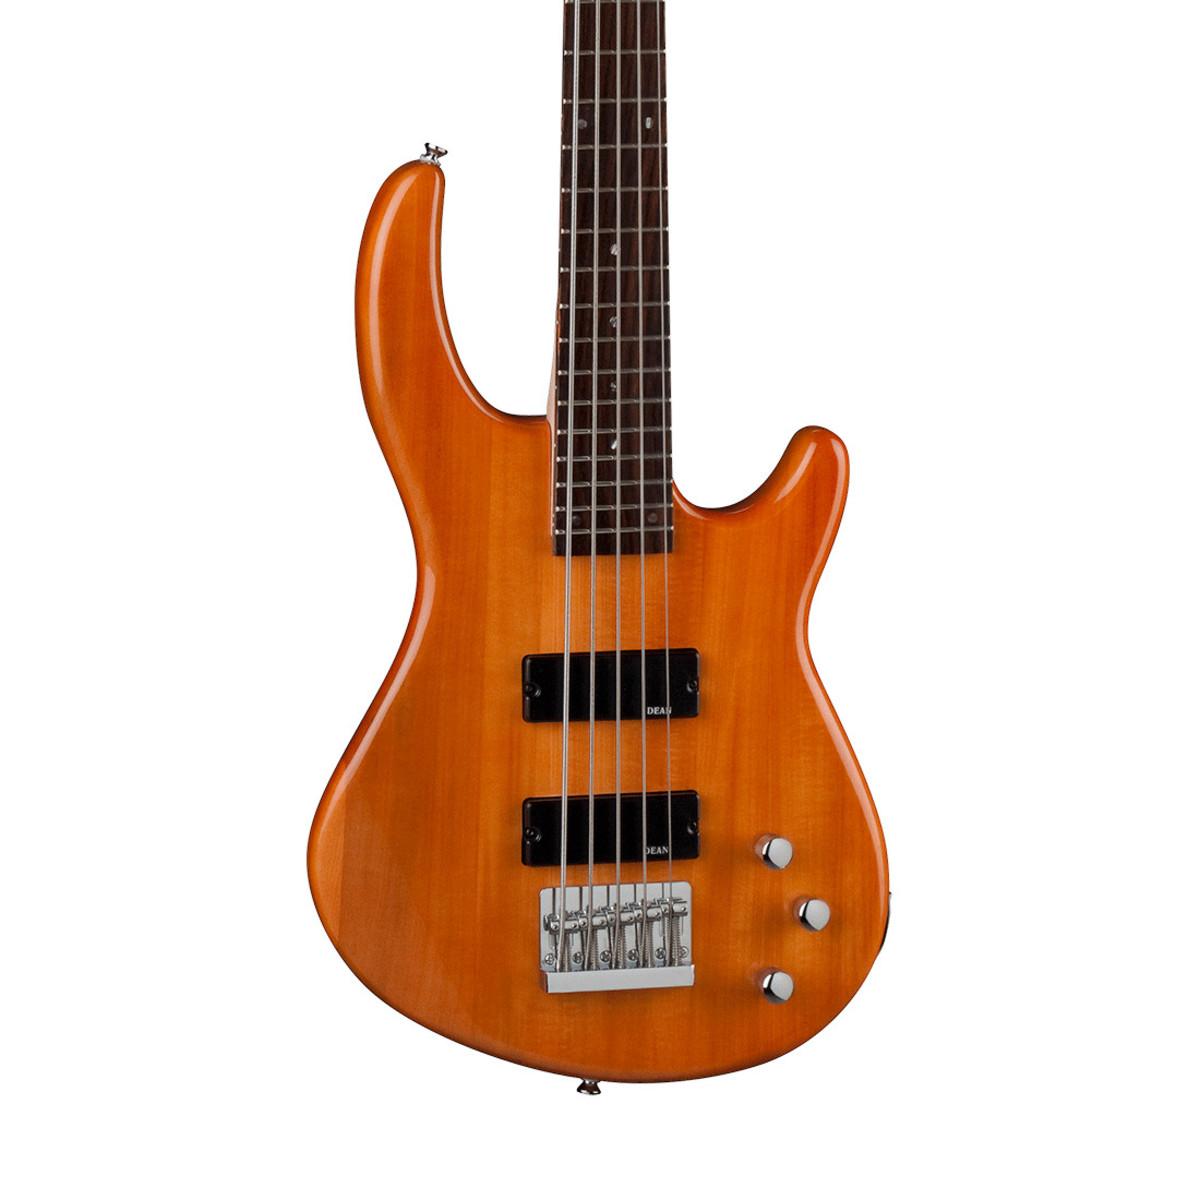 dean edge 1 5 string bass guitar trans amber at. Black Bedroom Furniture Sets. Home Design Ideas